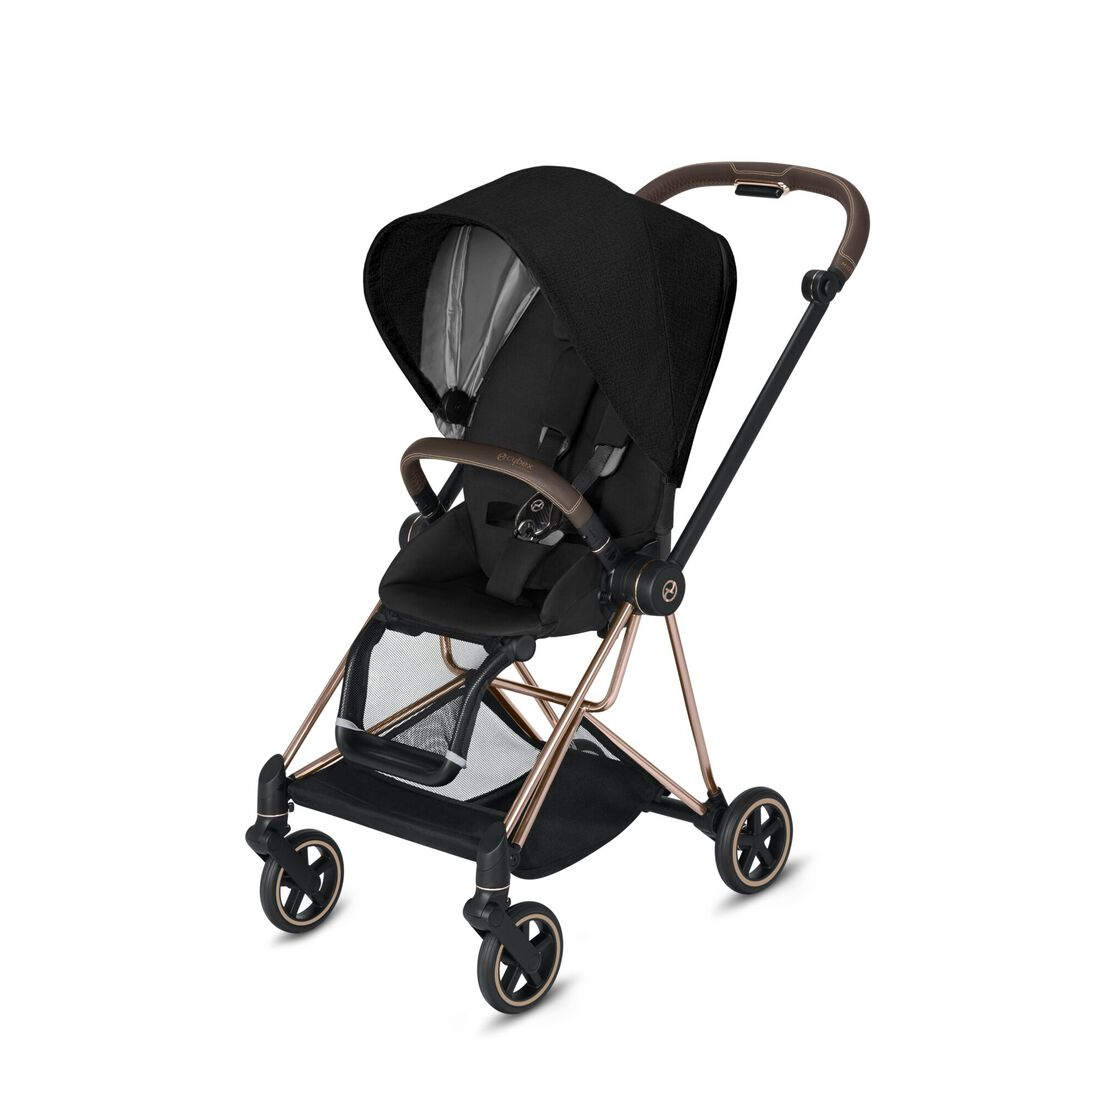 CYBEX Mios Seat Pack - Stardust Black Plus in Stardust Black Plus large